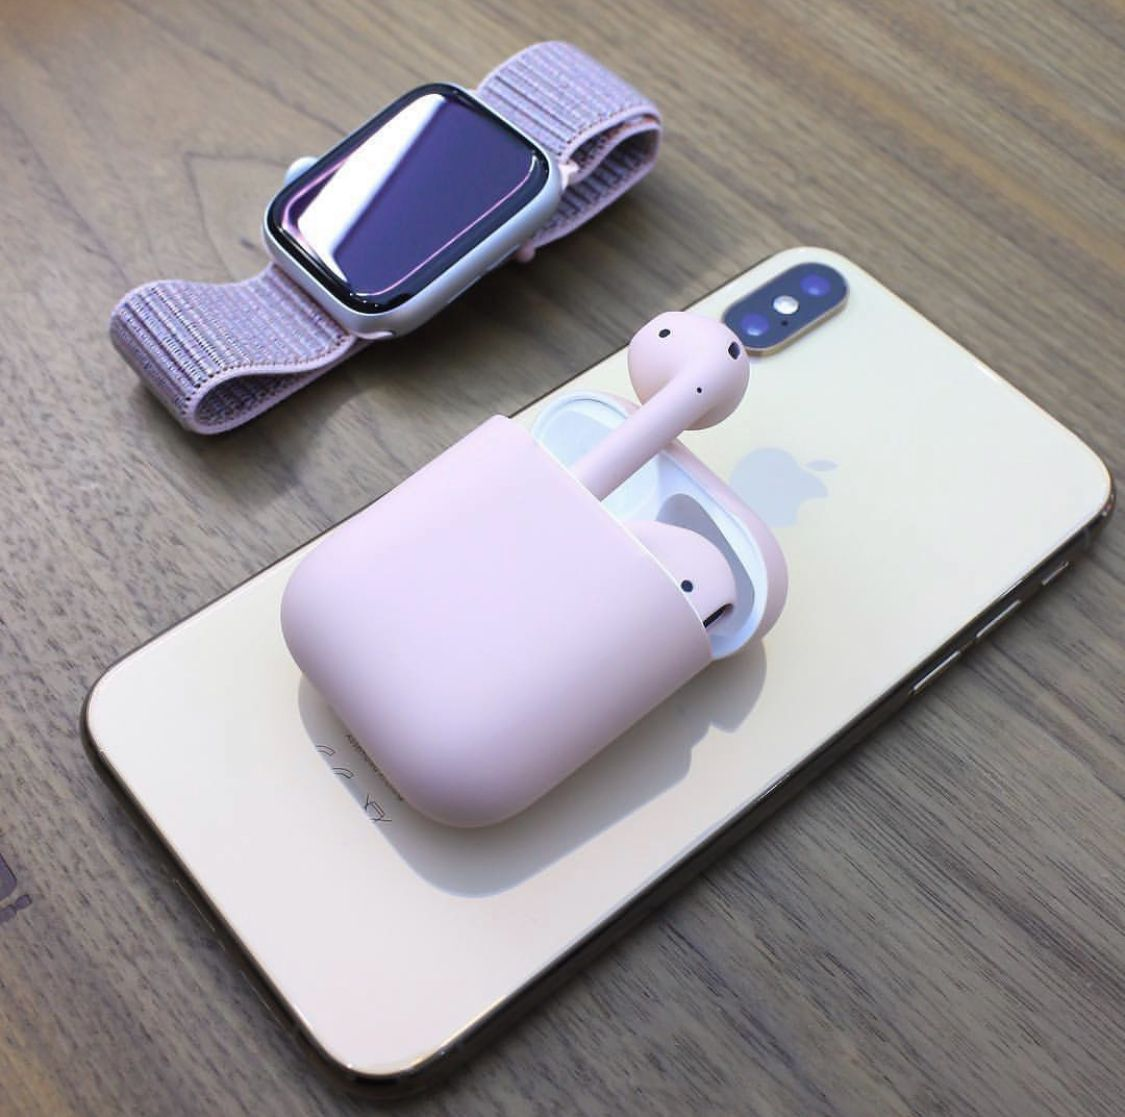 Electronique Apple Iphone Accessories Iphone Accessories Iphone Phone Cases